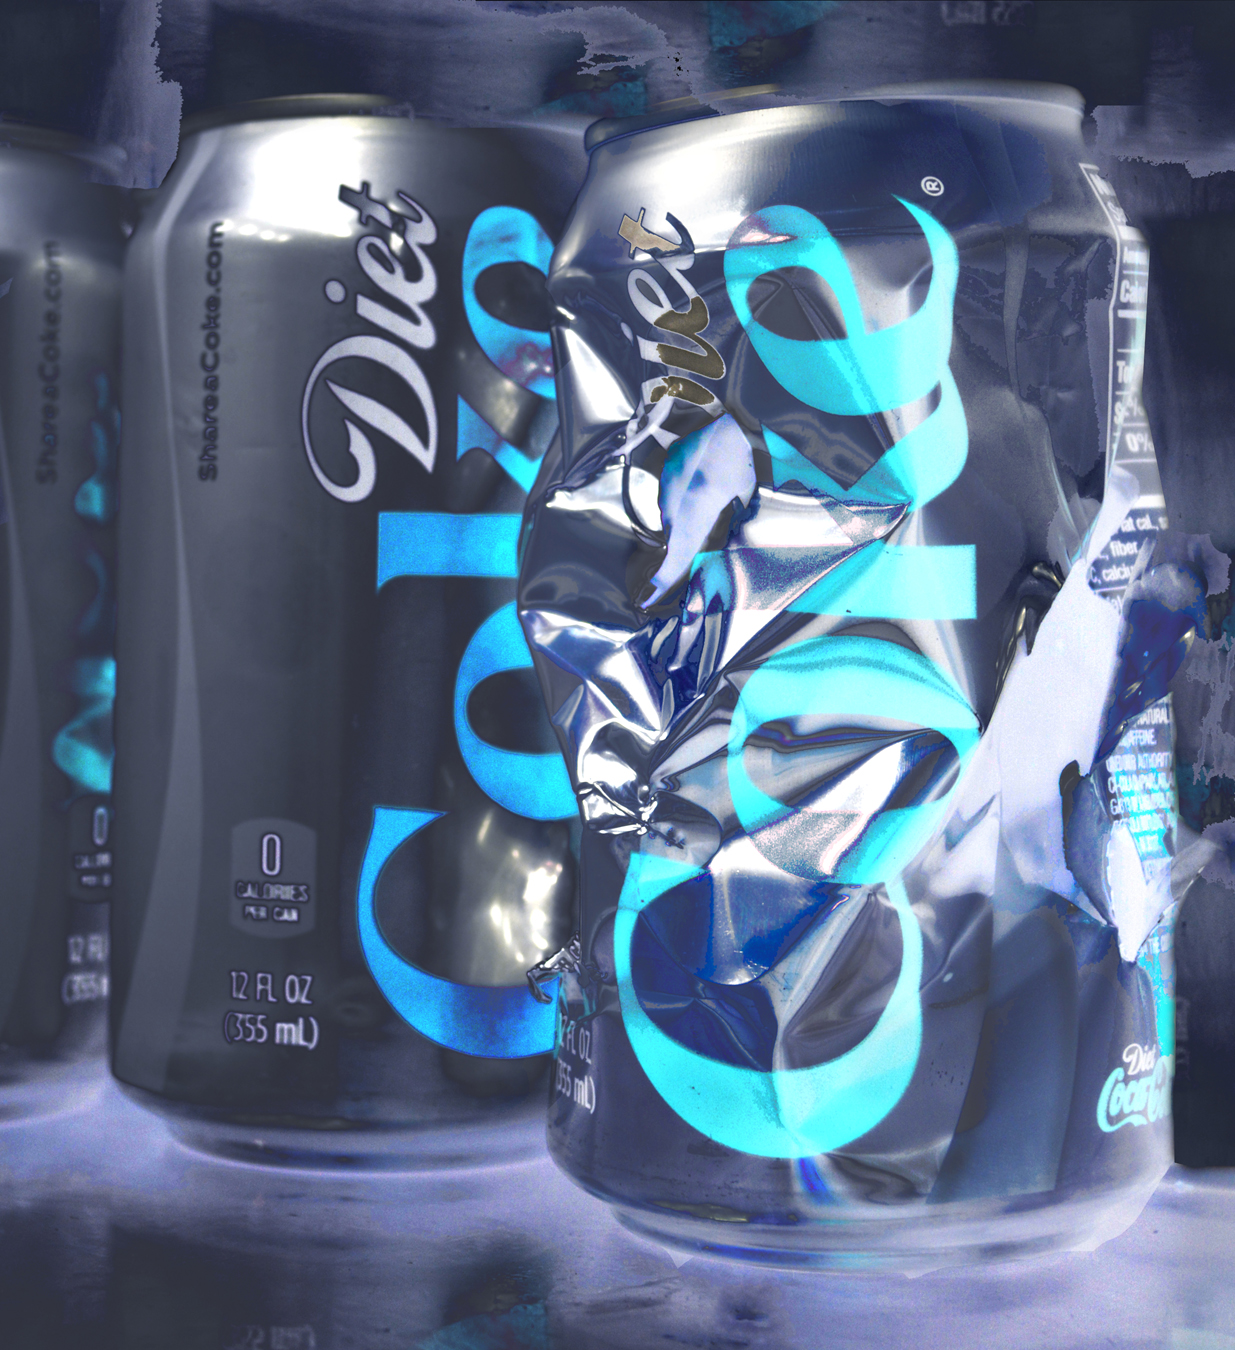 Inverted Coke